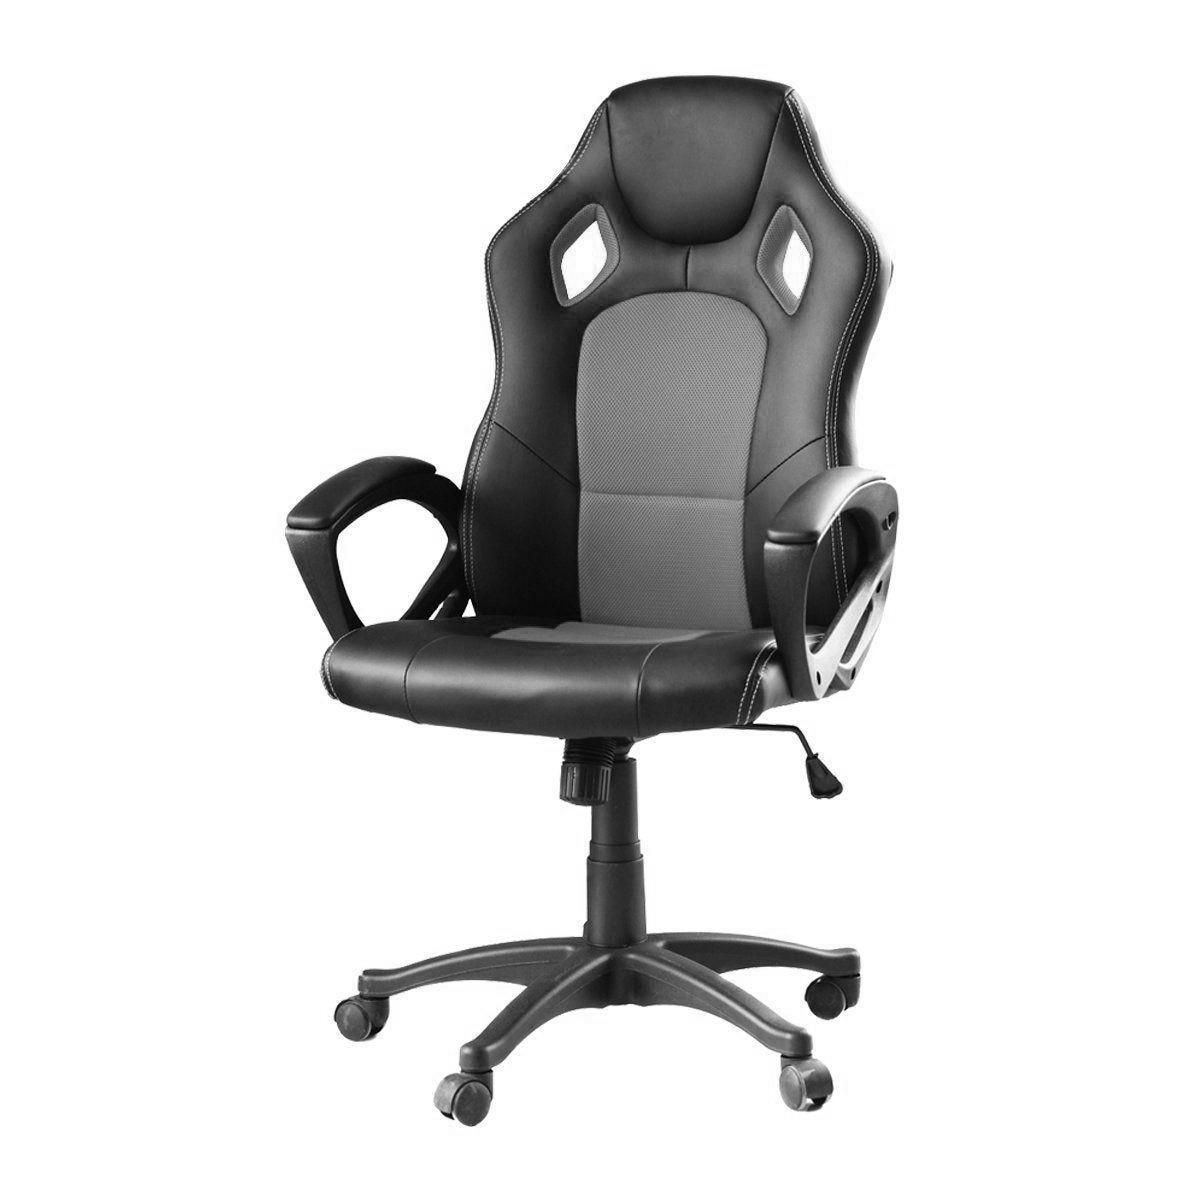 Iris GCH102BR Gamer szék, FeketePiros eMAG.hu